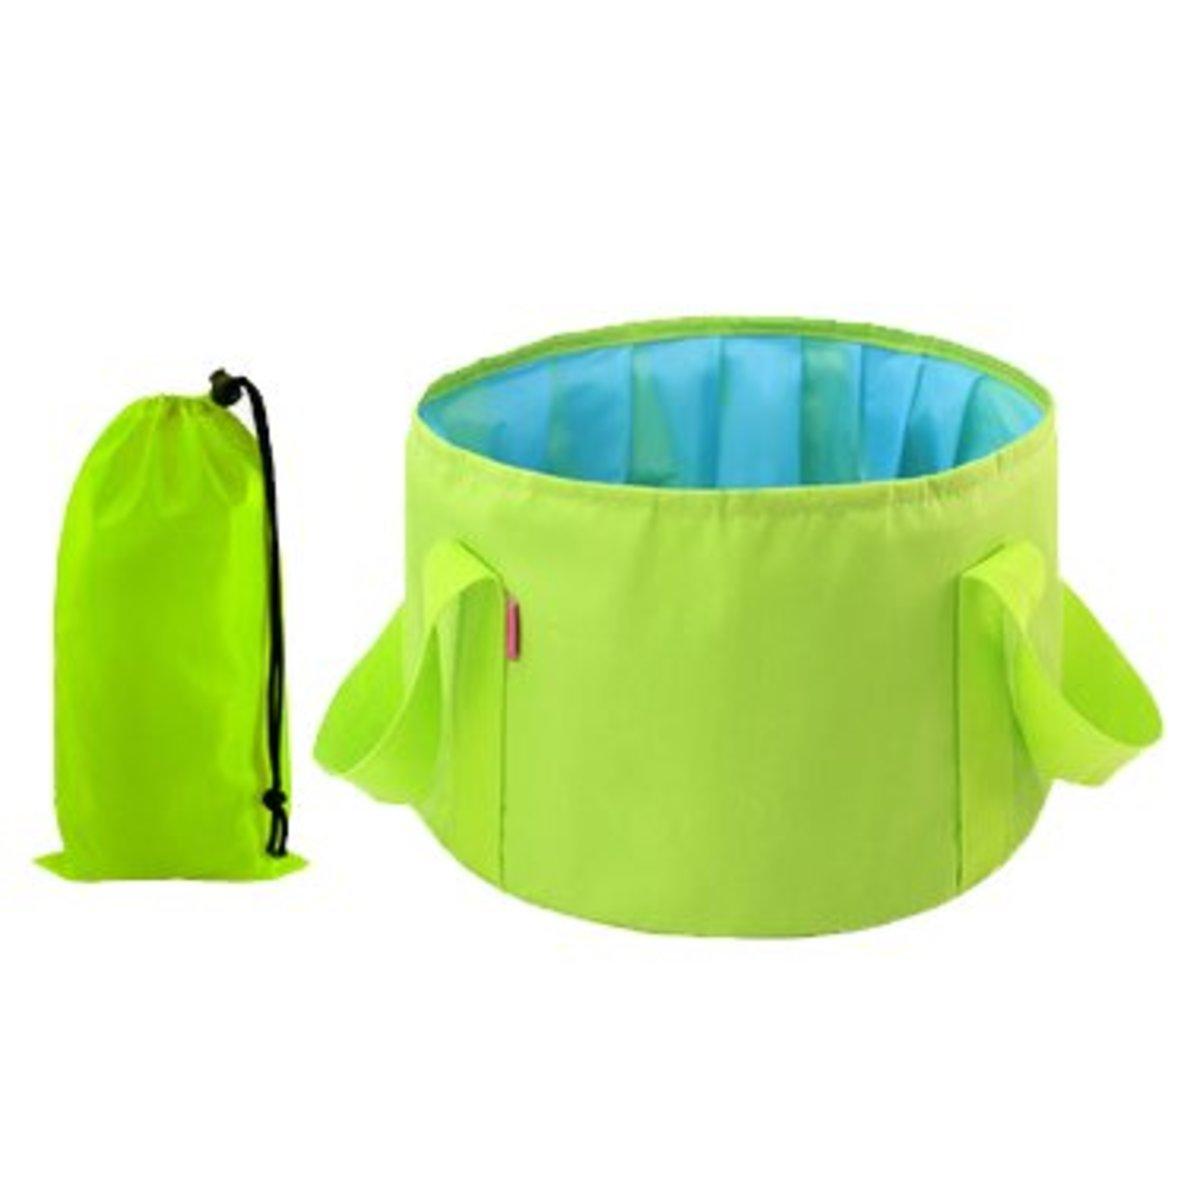 Outdoor portable folding basin, soaked footbasin washbasin